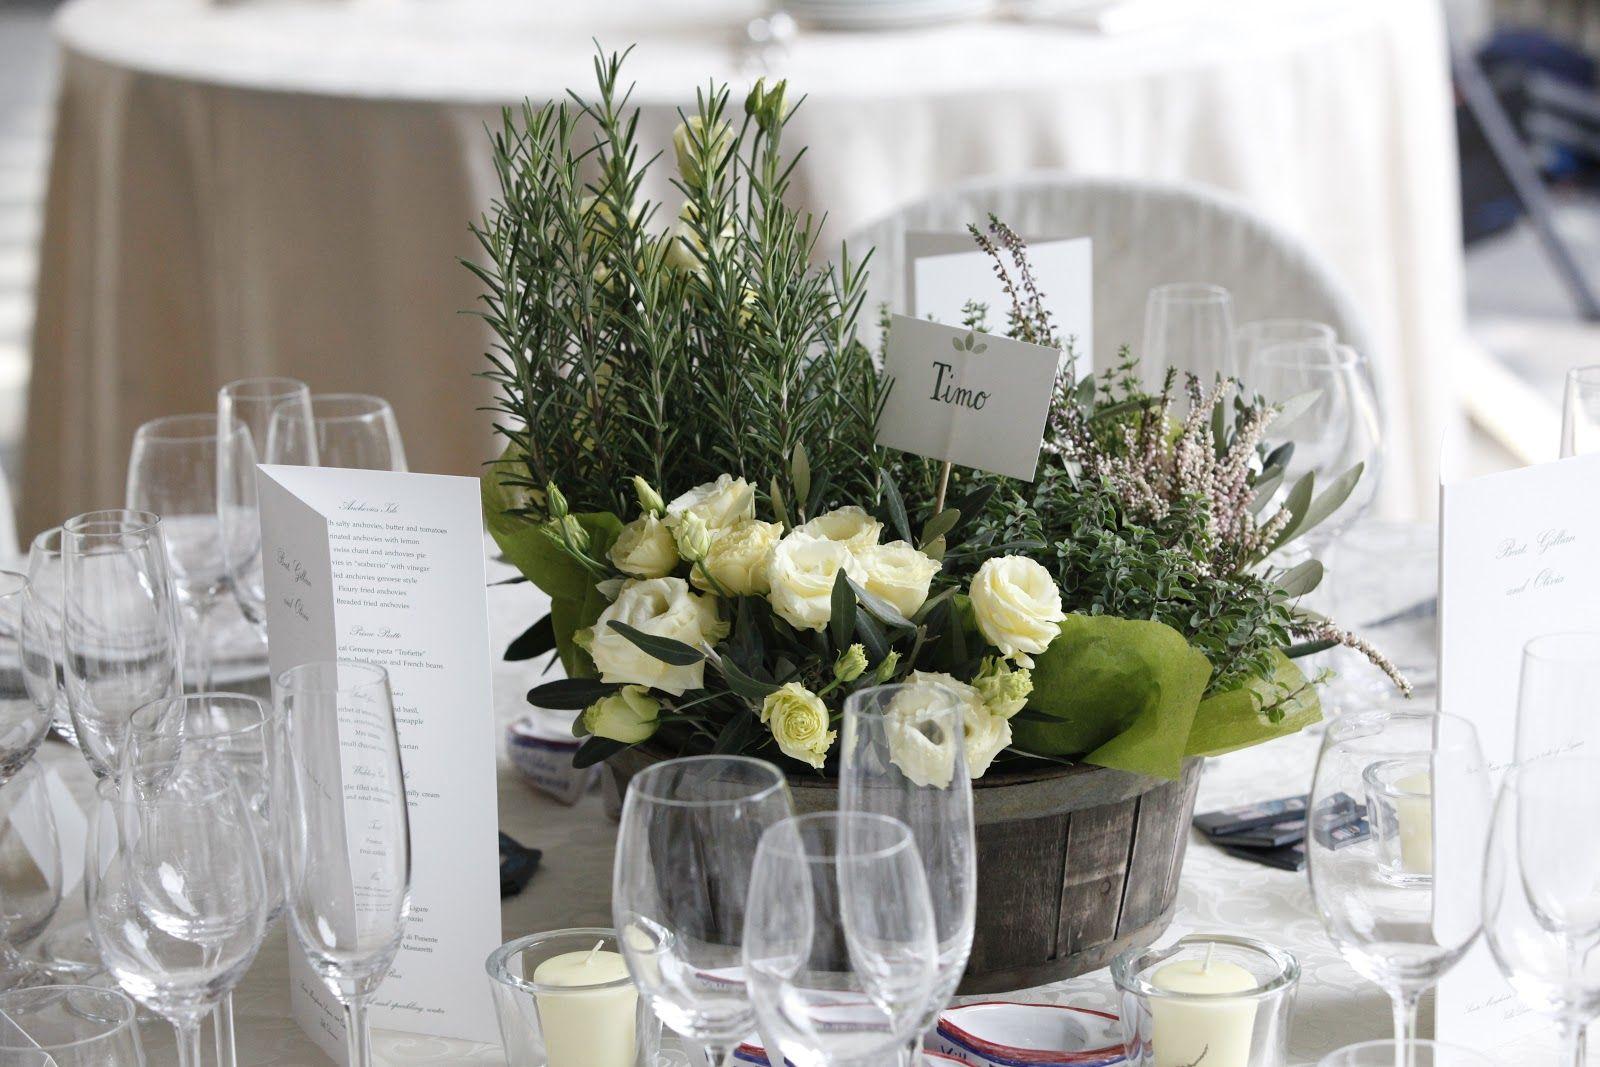 Matrimonio Rustico Idee : Centrotavola piante aromatiche green wedding pinterest